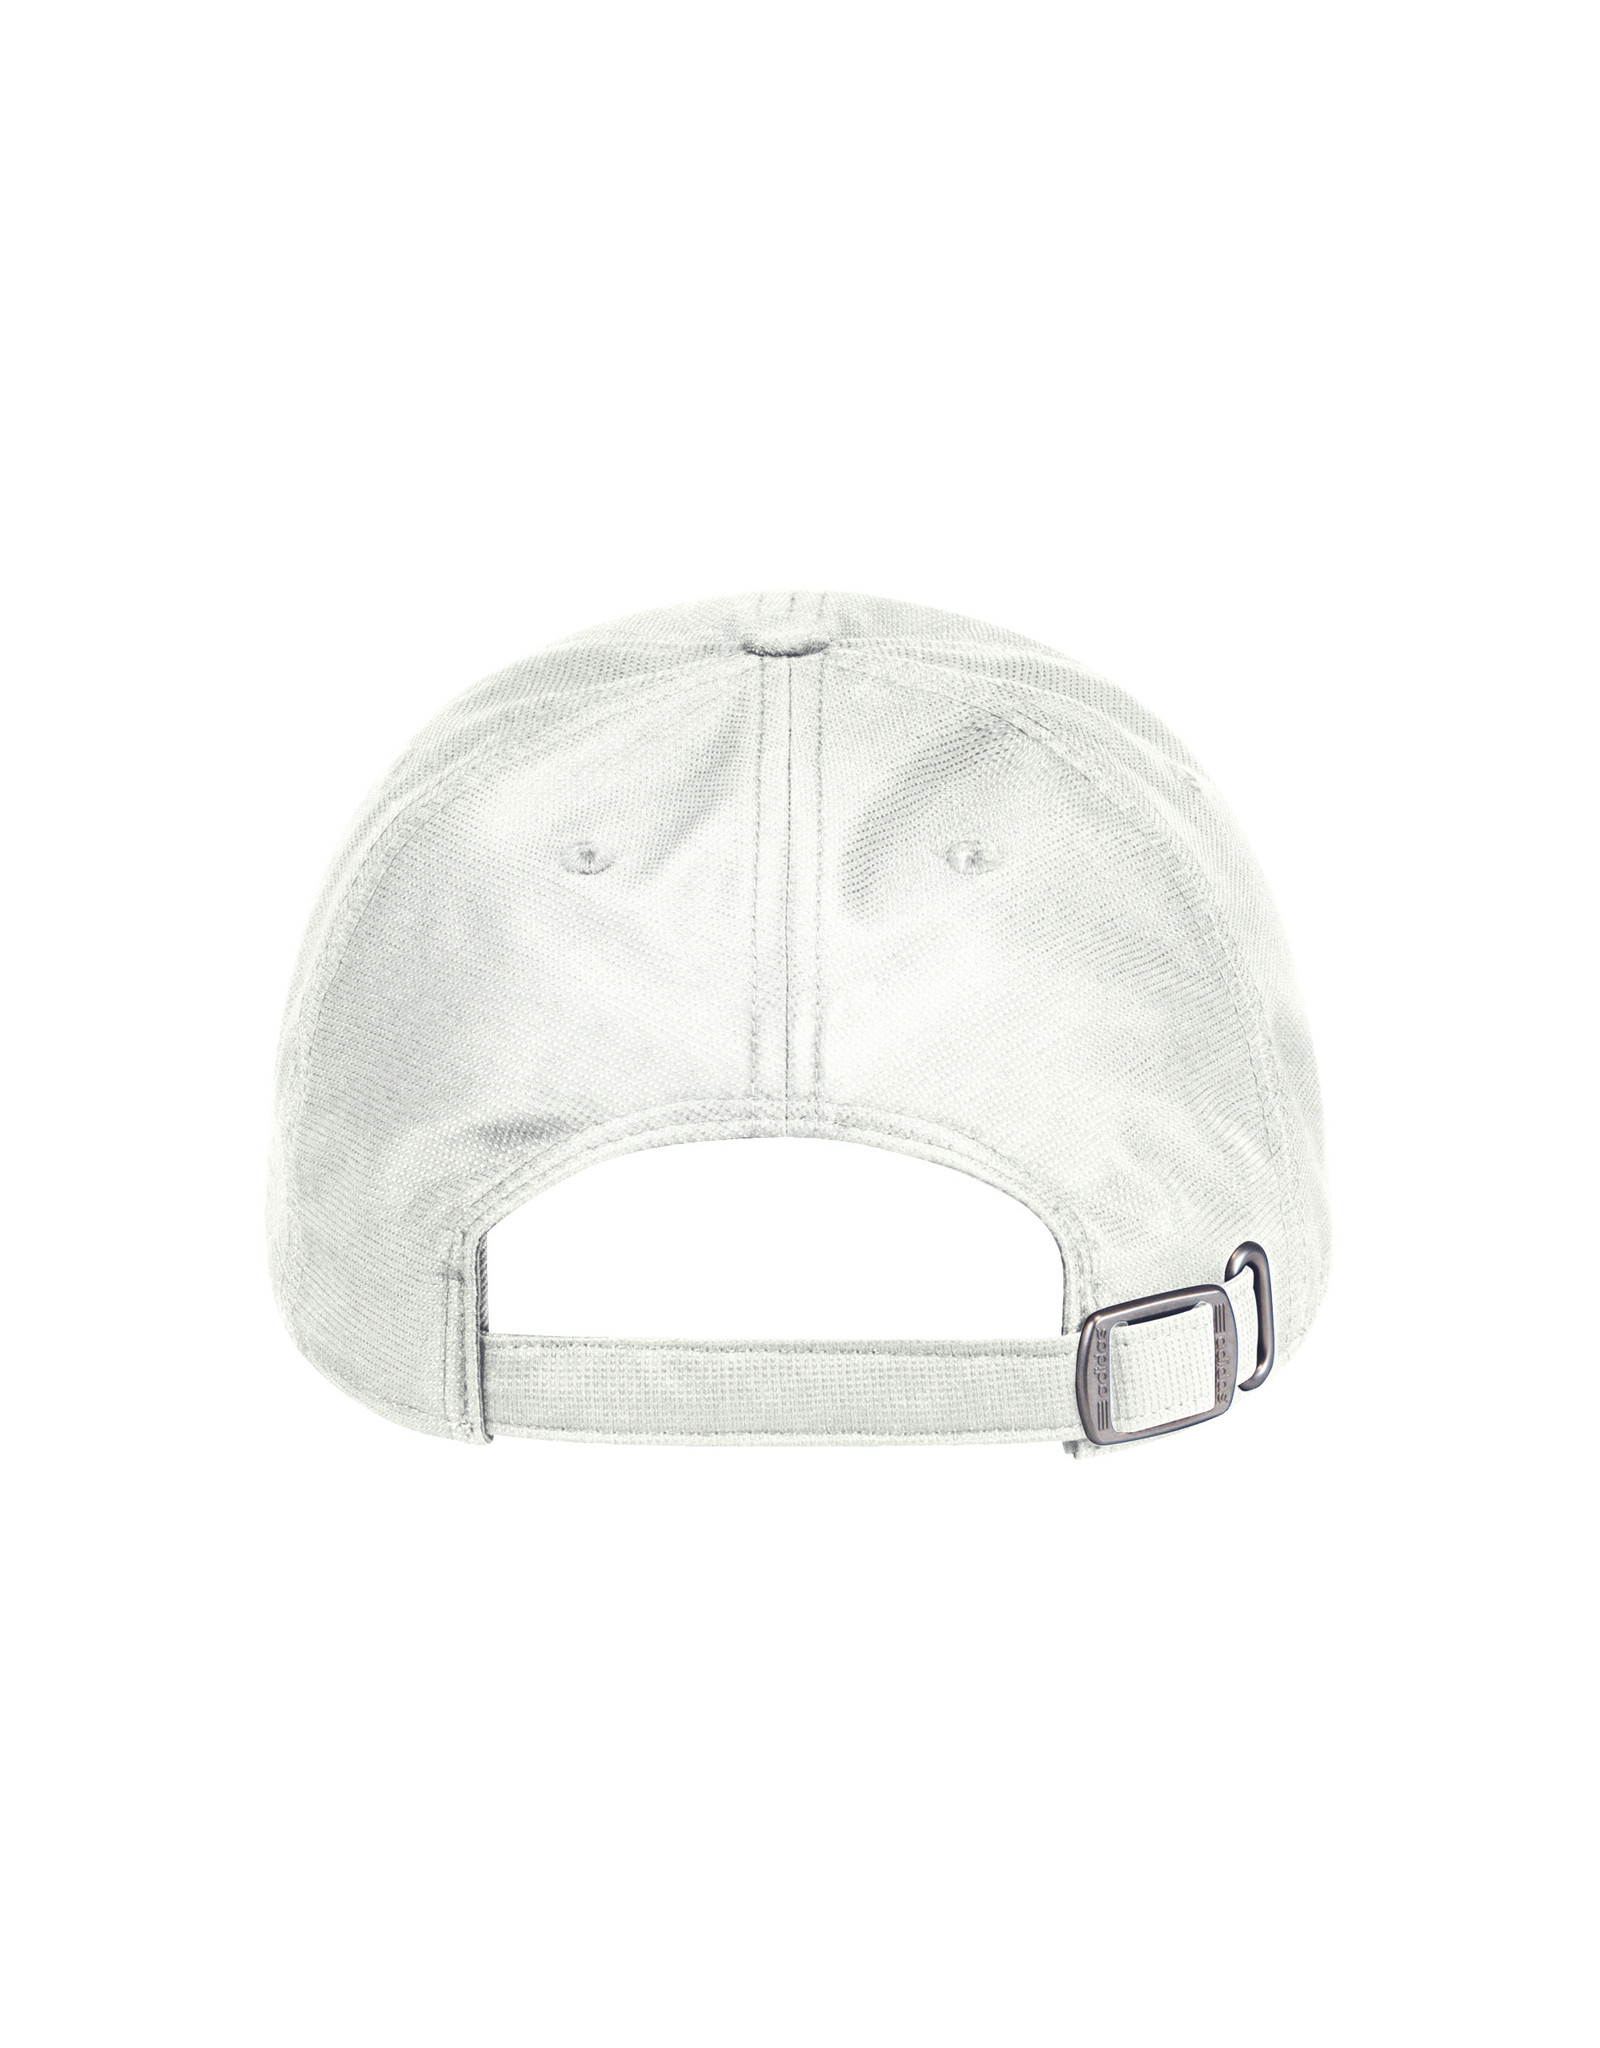 Adidas Owl Mascot Hat Adjustable White